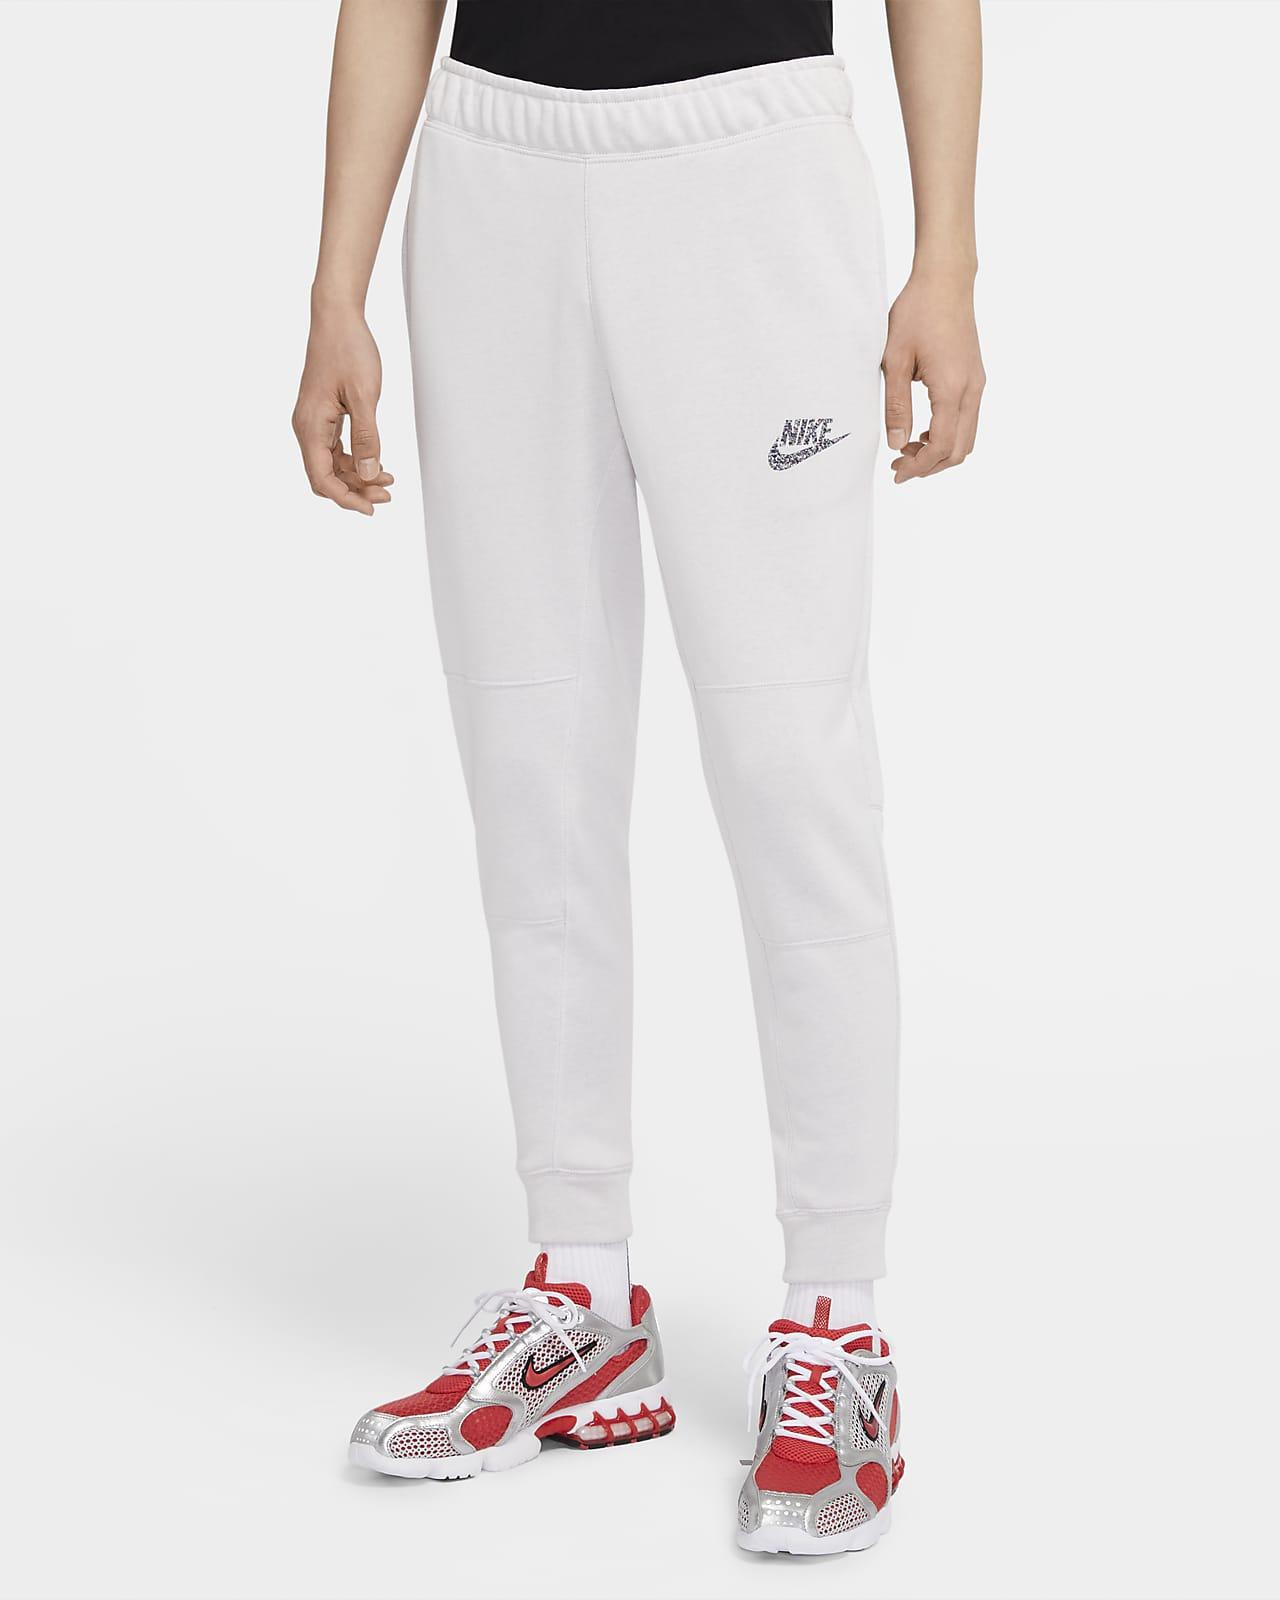 Nike Sportswear Joggers - Home